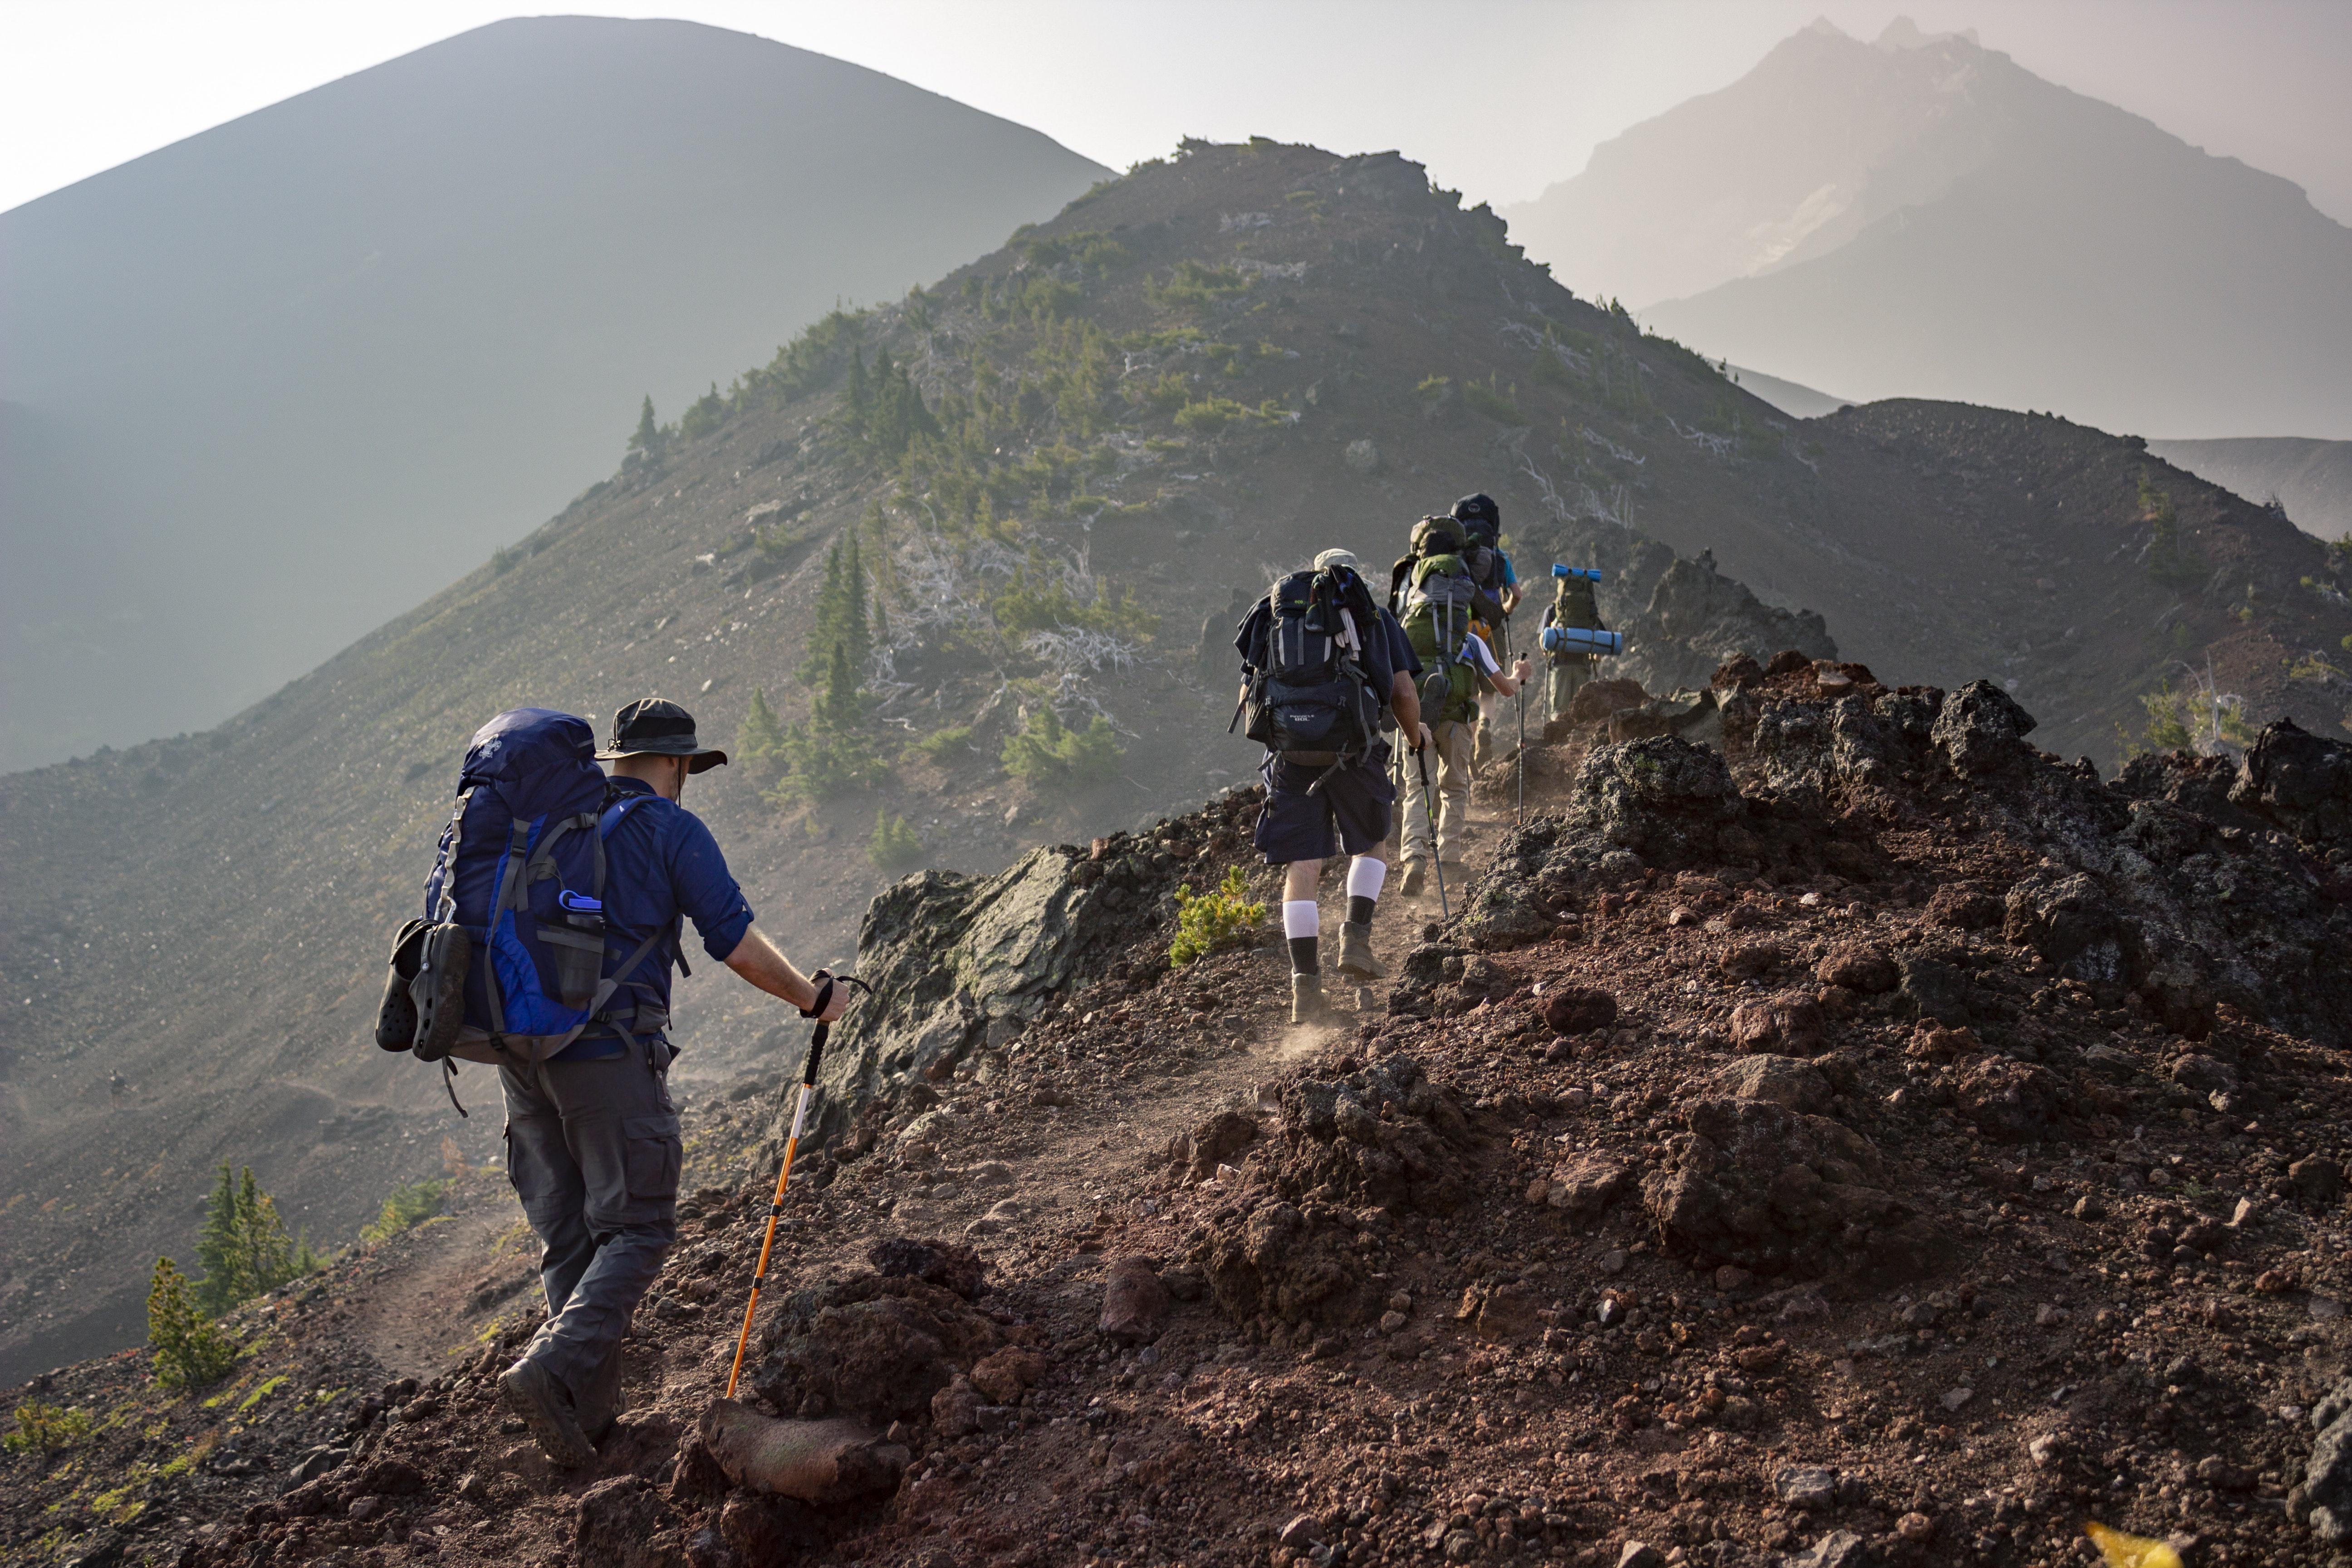 Mountain climbing images 2